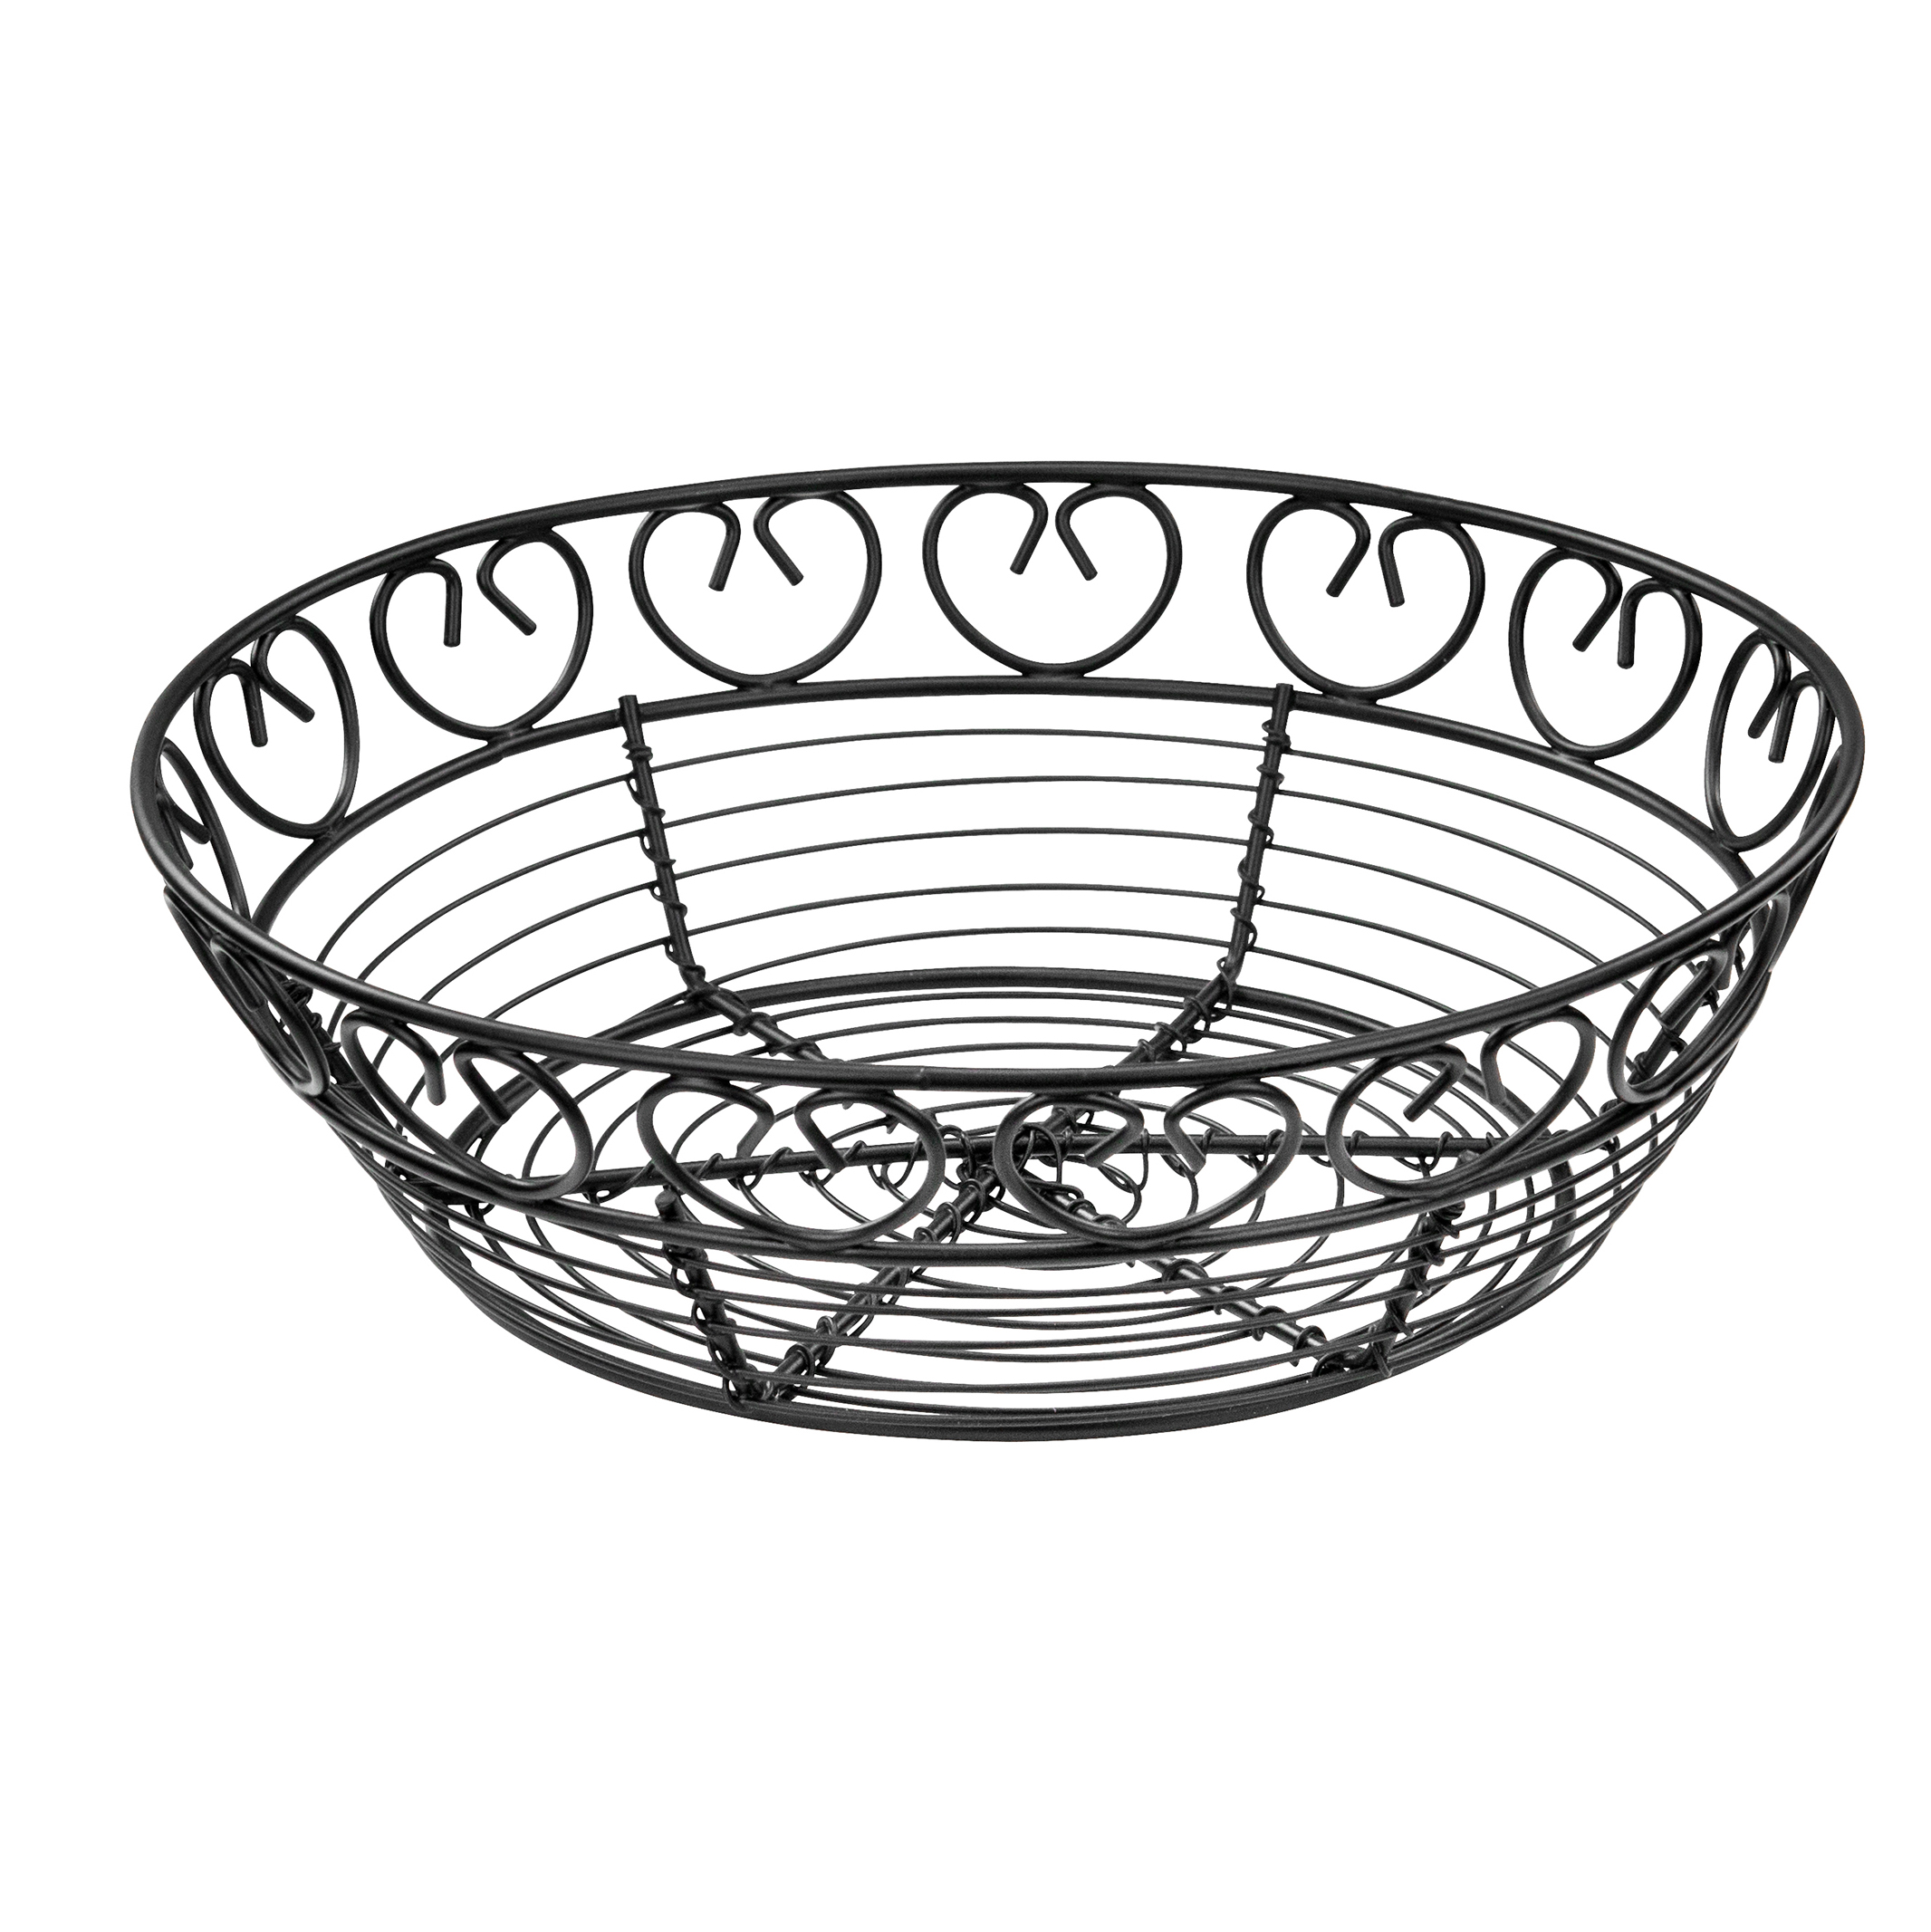 Winco WBKG-8R basket, tabletop, metal